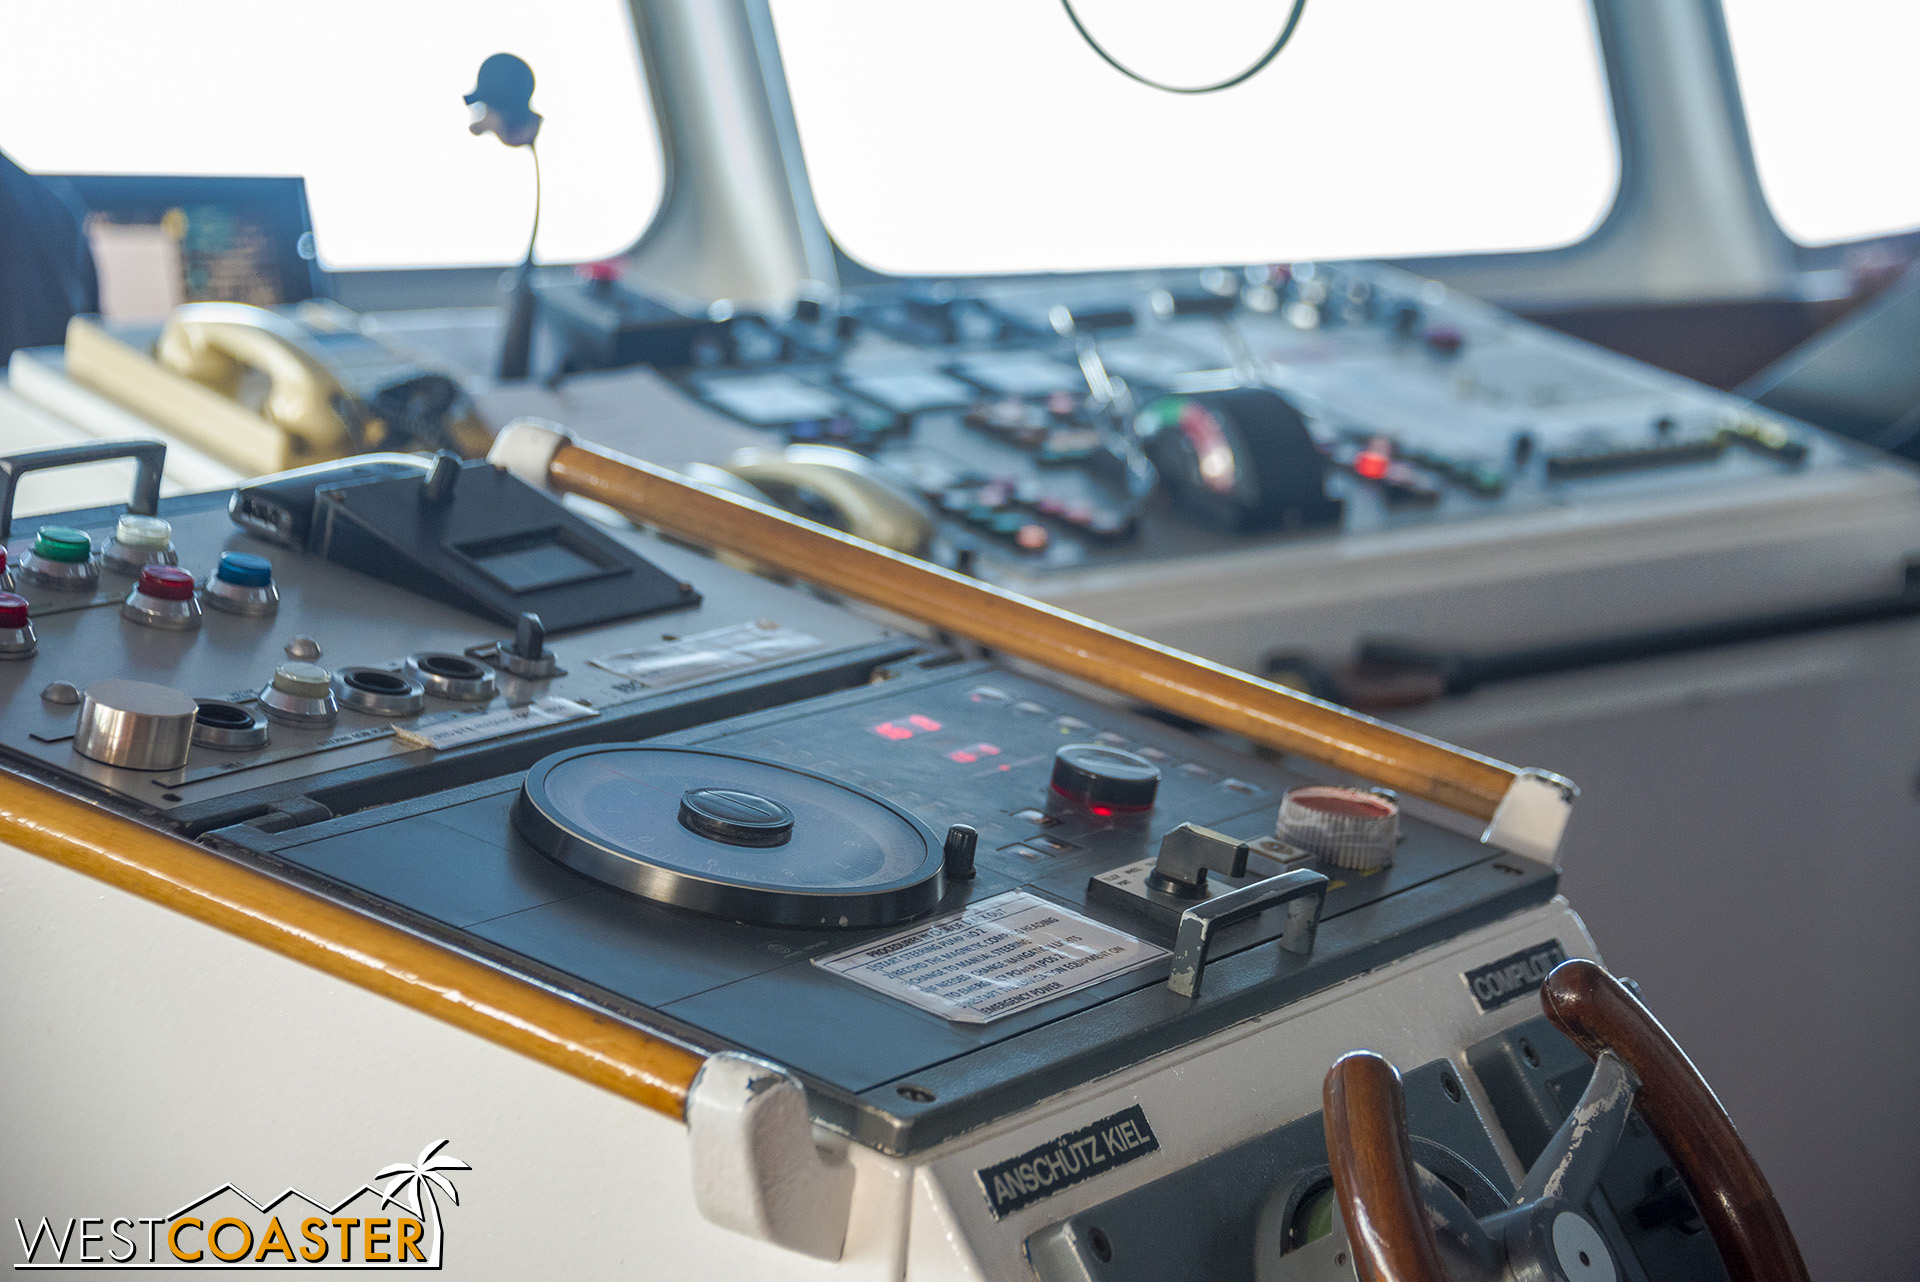 Antarctica-19_0318-B-OceanDiamond-0005.jpg